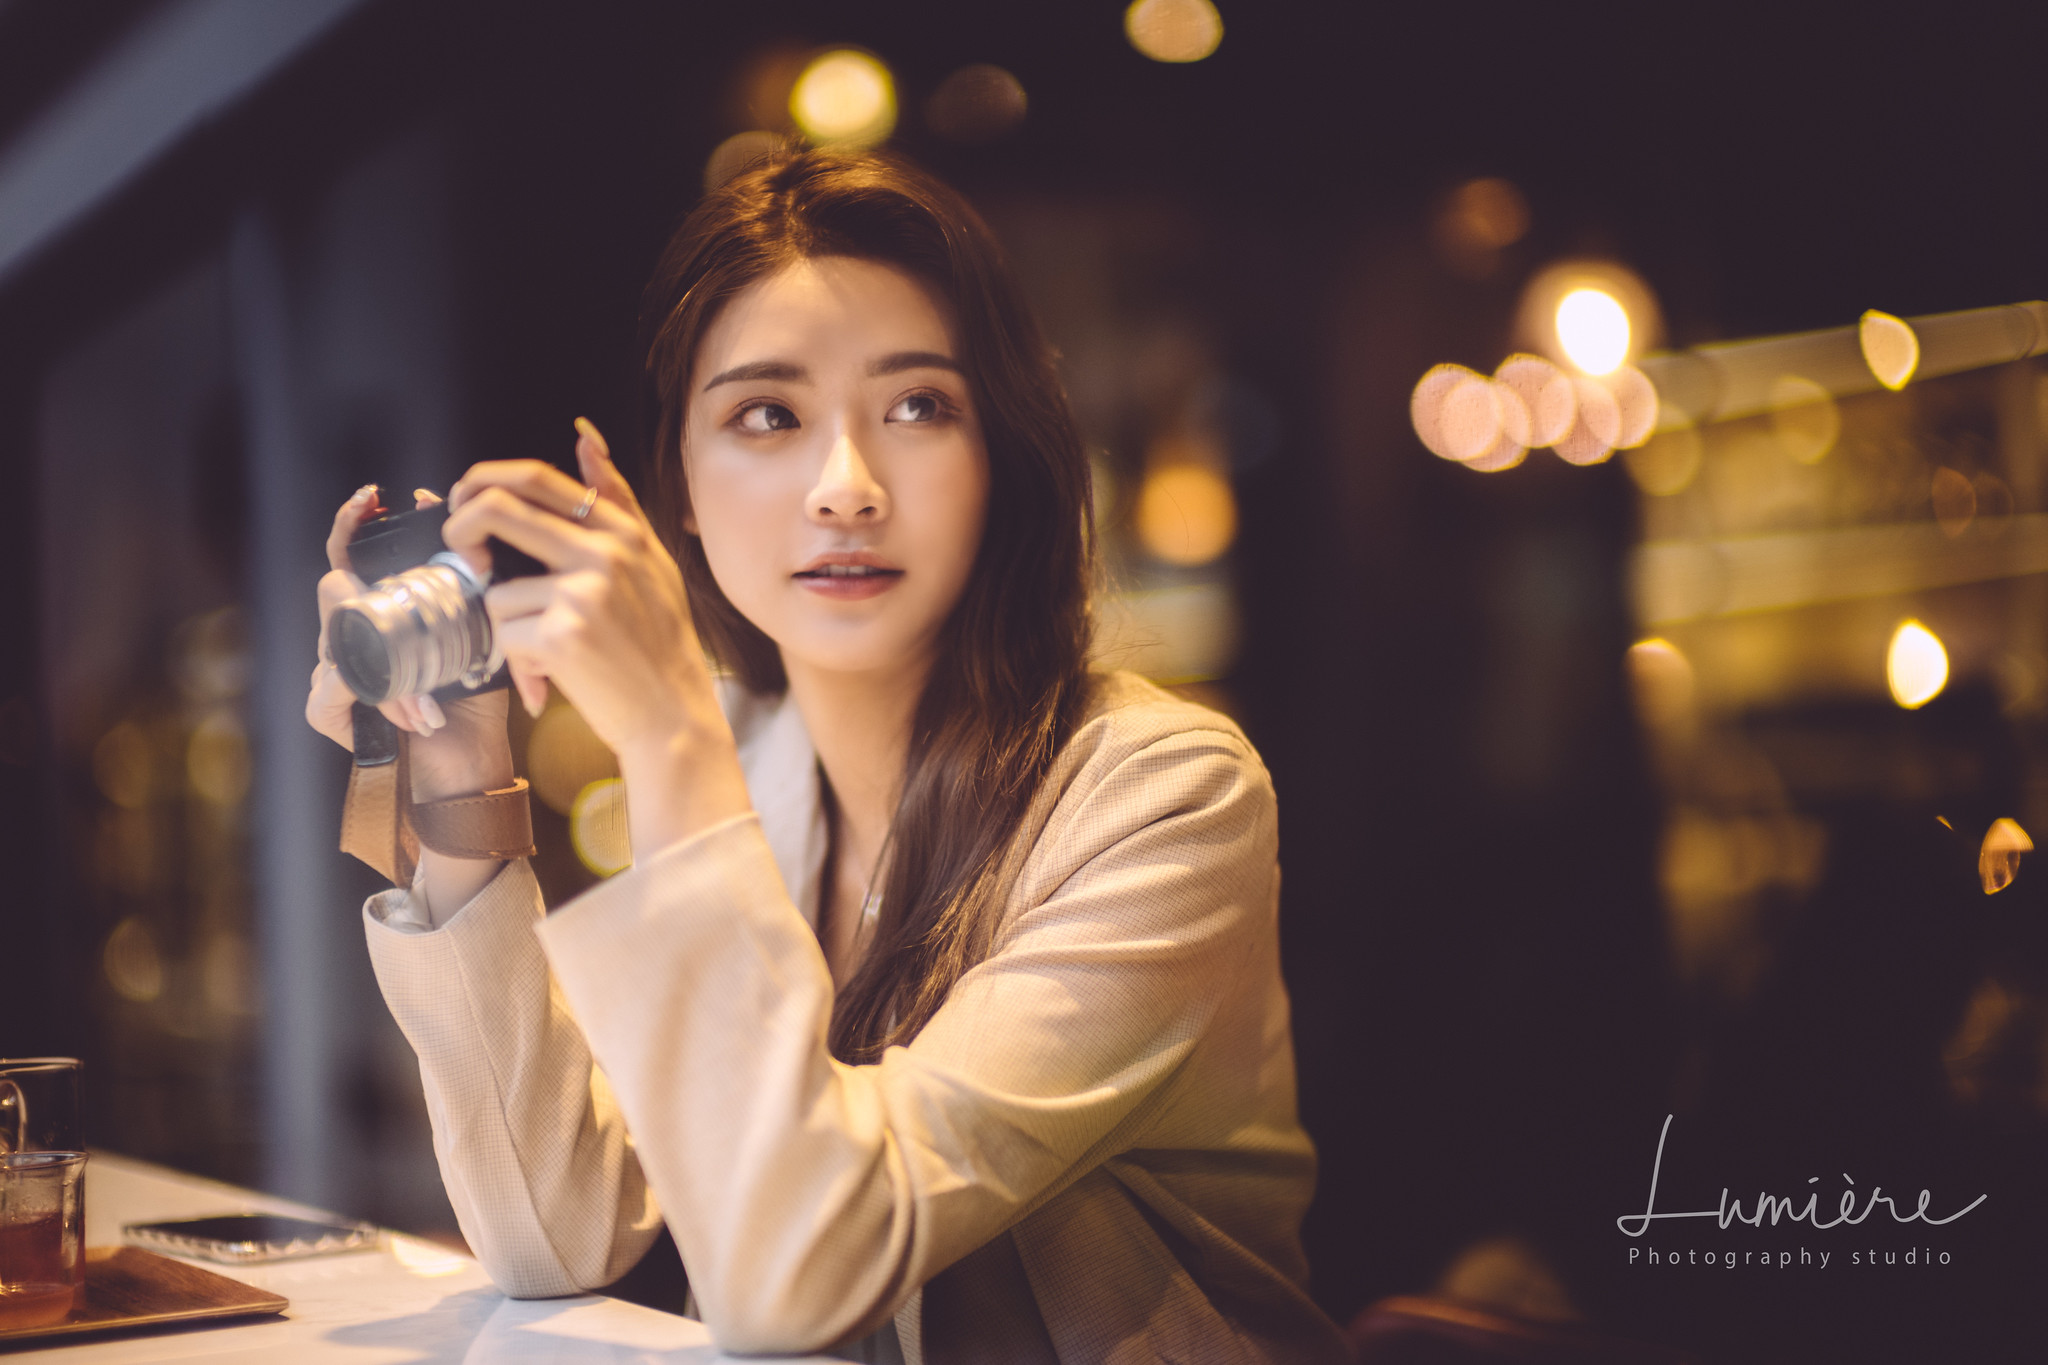 『分享』 Leica影團 中山。隨影 Leica Noctilux-M 50 mm f/0.95 ASPH.